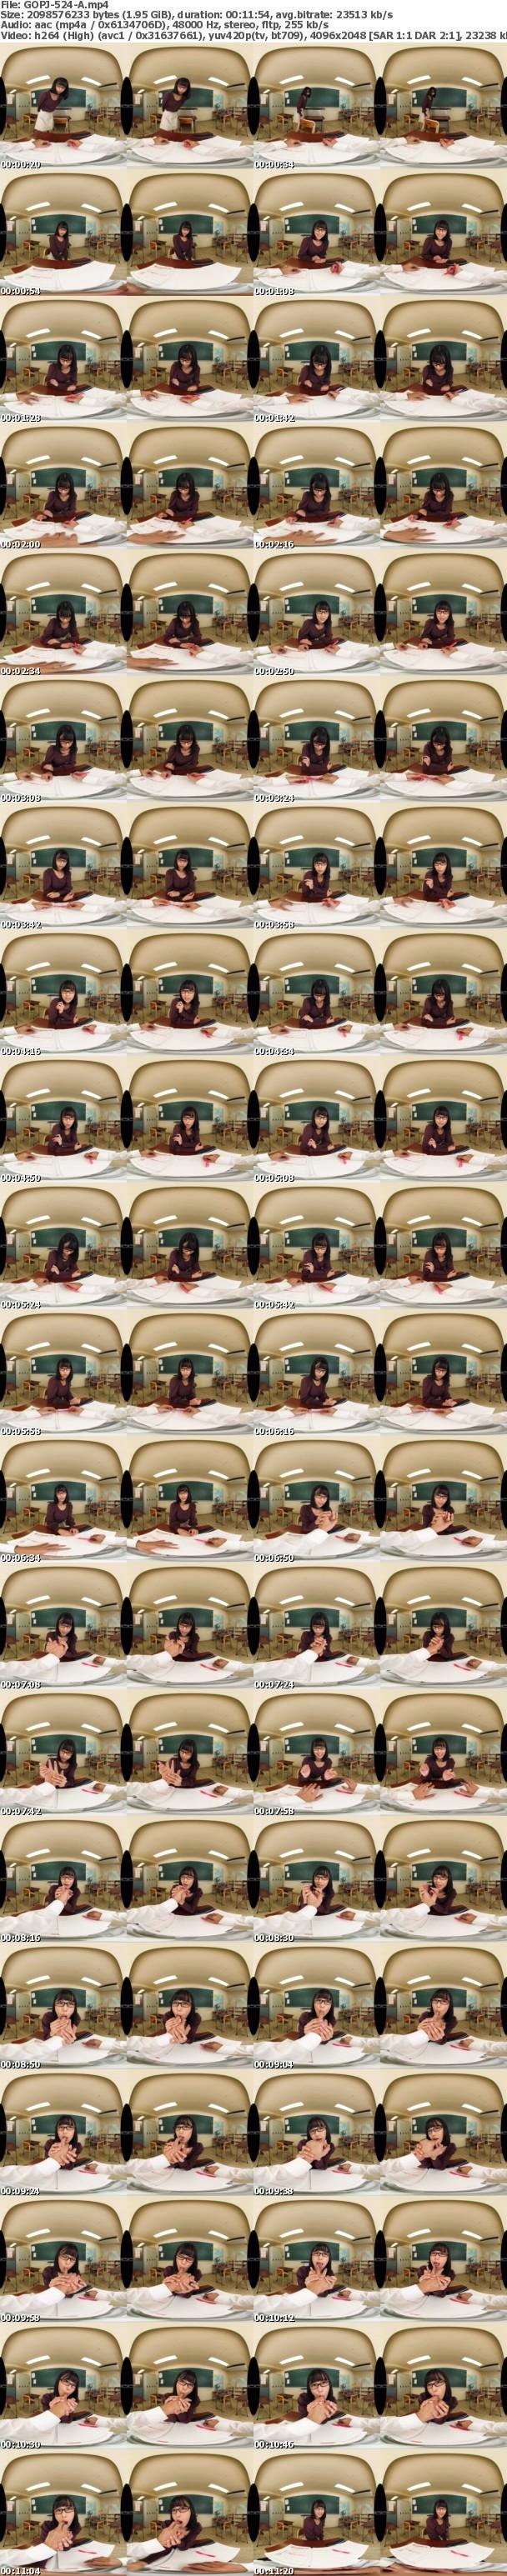 (VR) GOPJ-524 HQ 劇的超高画質 真面目な女教師が実は痴女!? 発情フル勃起童貞男子に教える性教育淫語SEX